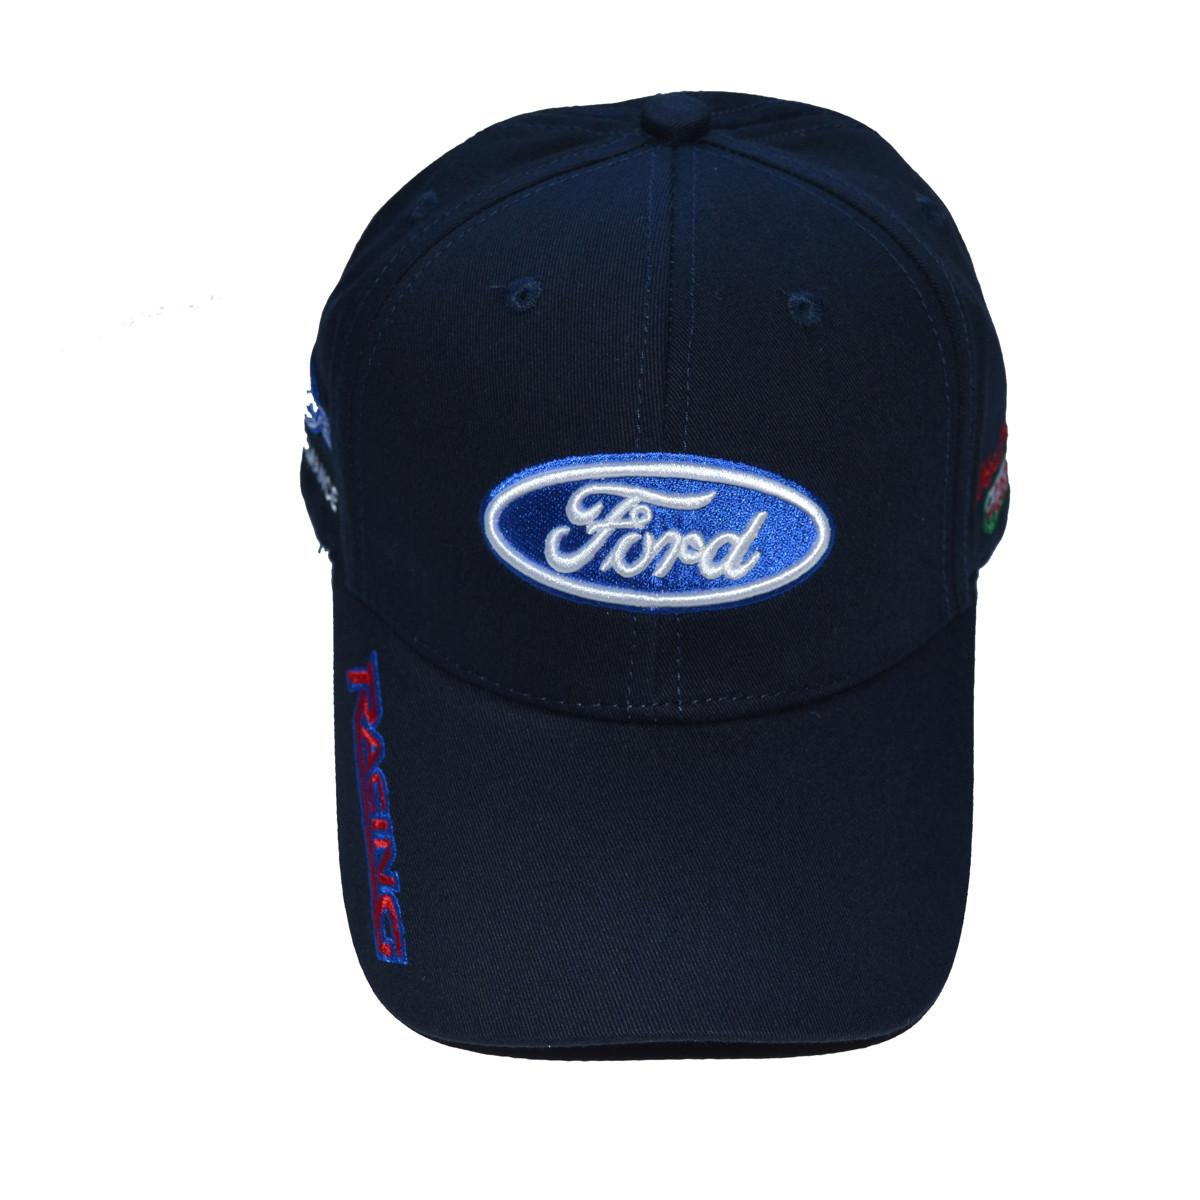 Бейсболка Classic Ford (31804-81)